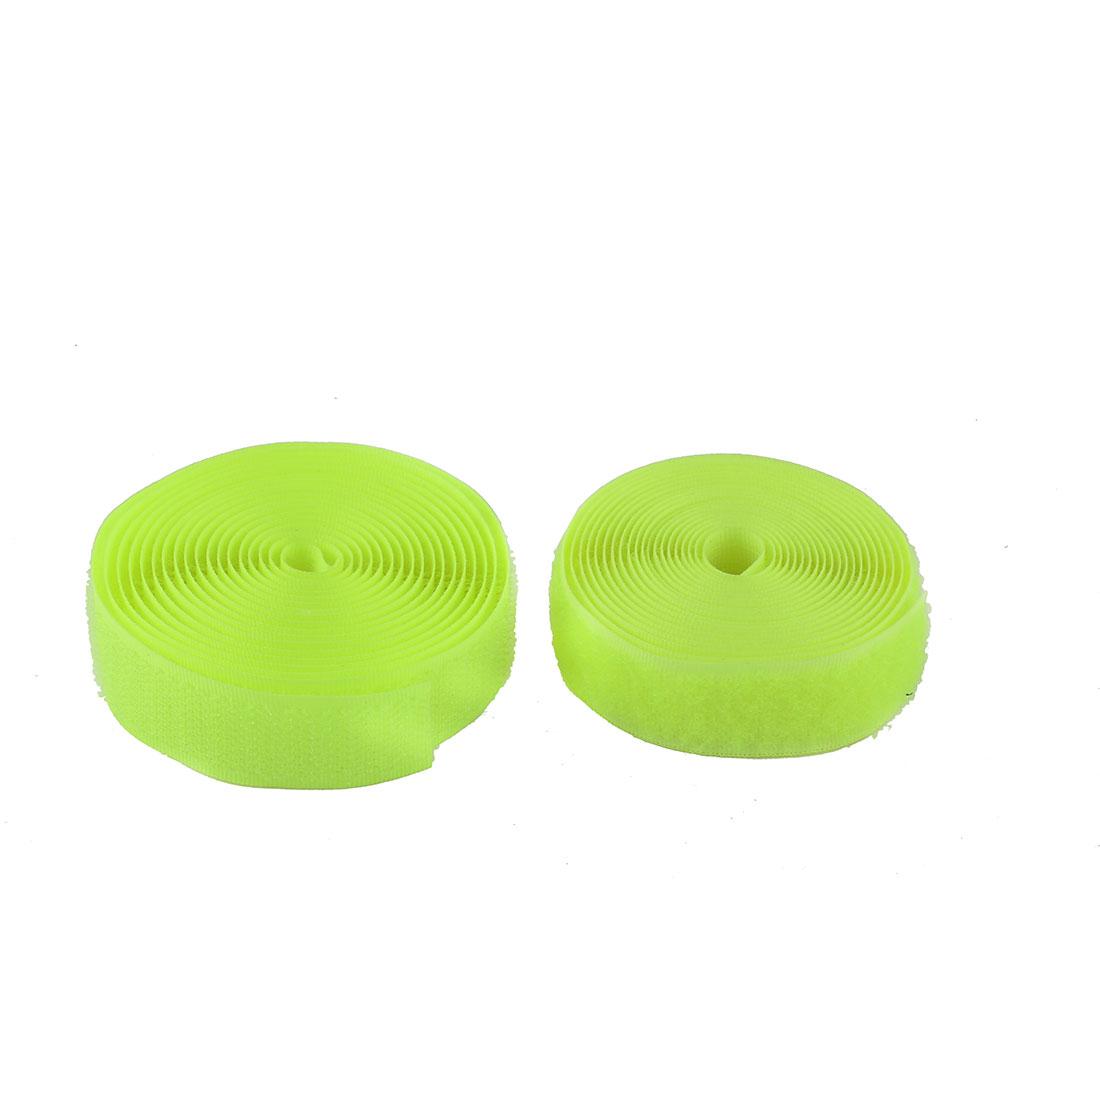 Nylon Sticky Back Strip Self Adhesive Fastener Tape Roll Light Green 2 in 1